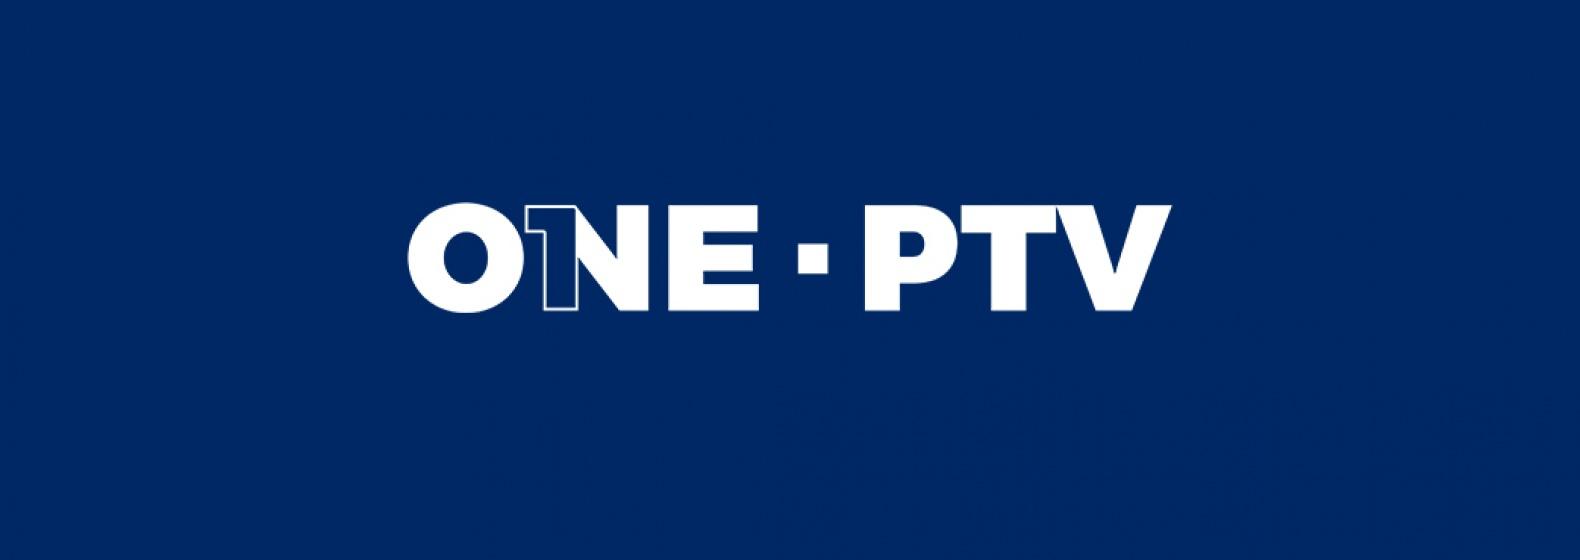 one-ptv-r.jpg